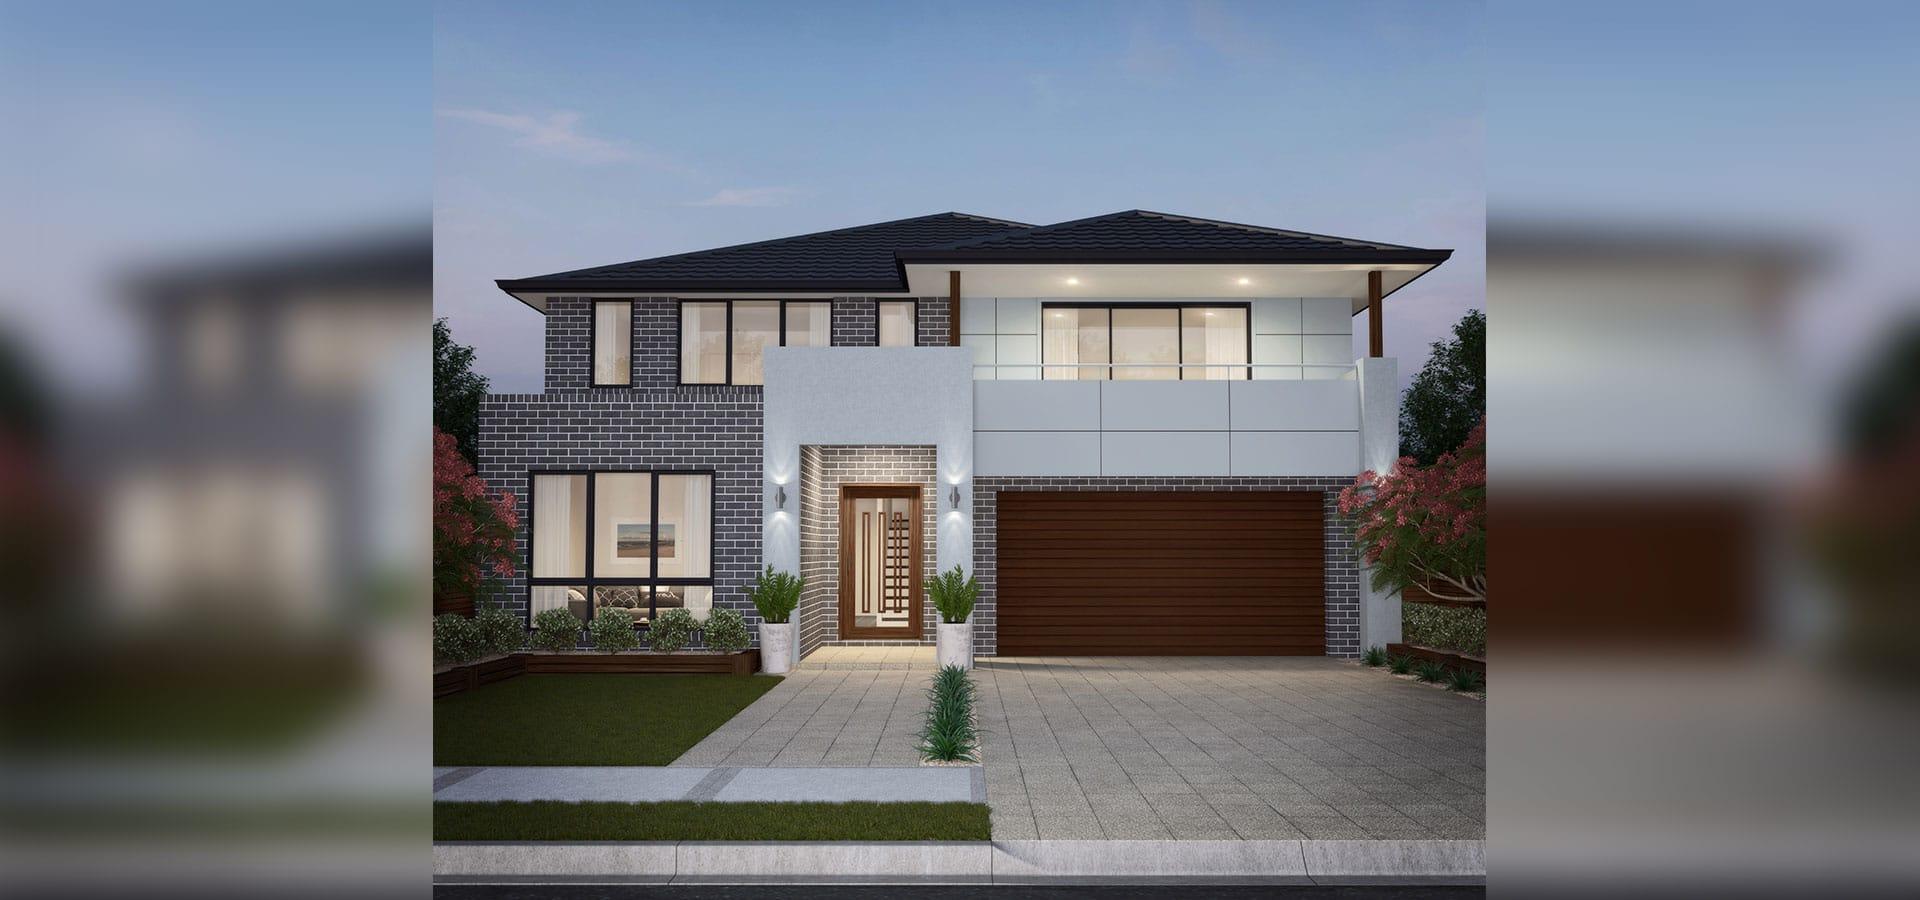 Dahlia_Dusk-Double-House-Design updated